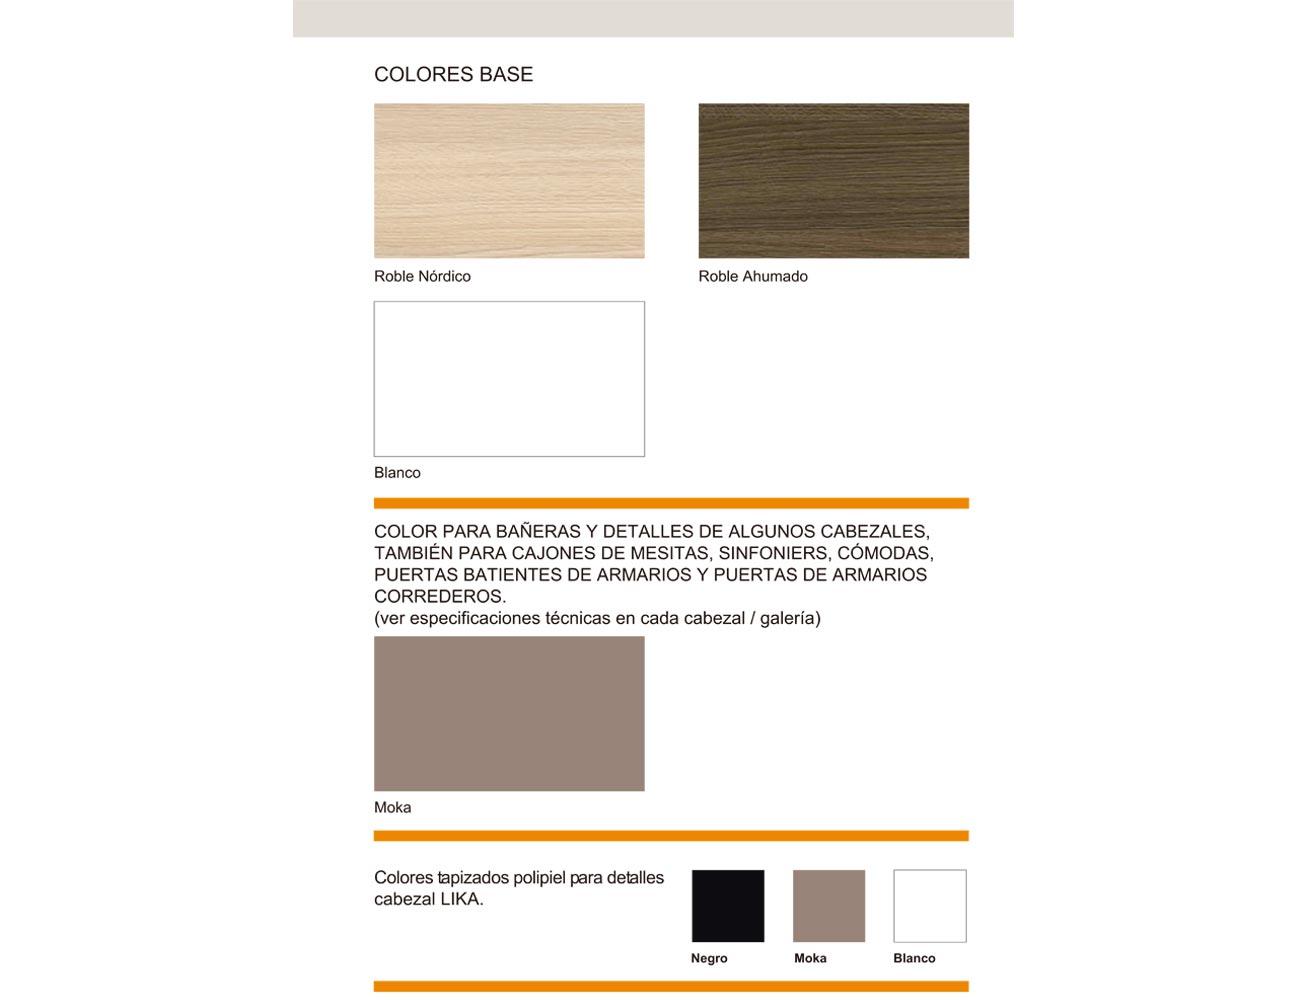 Colores266